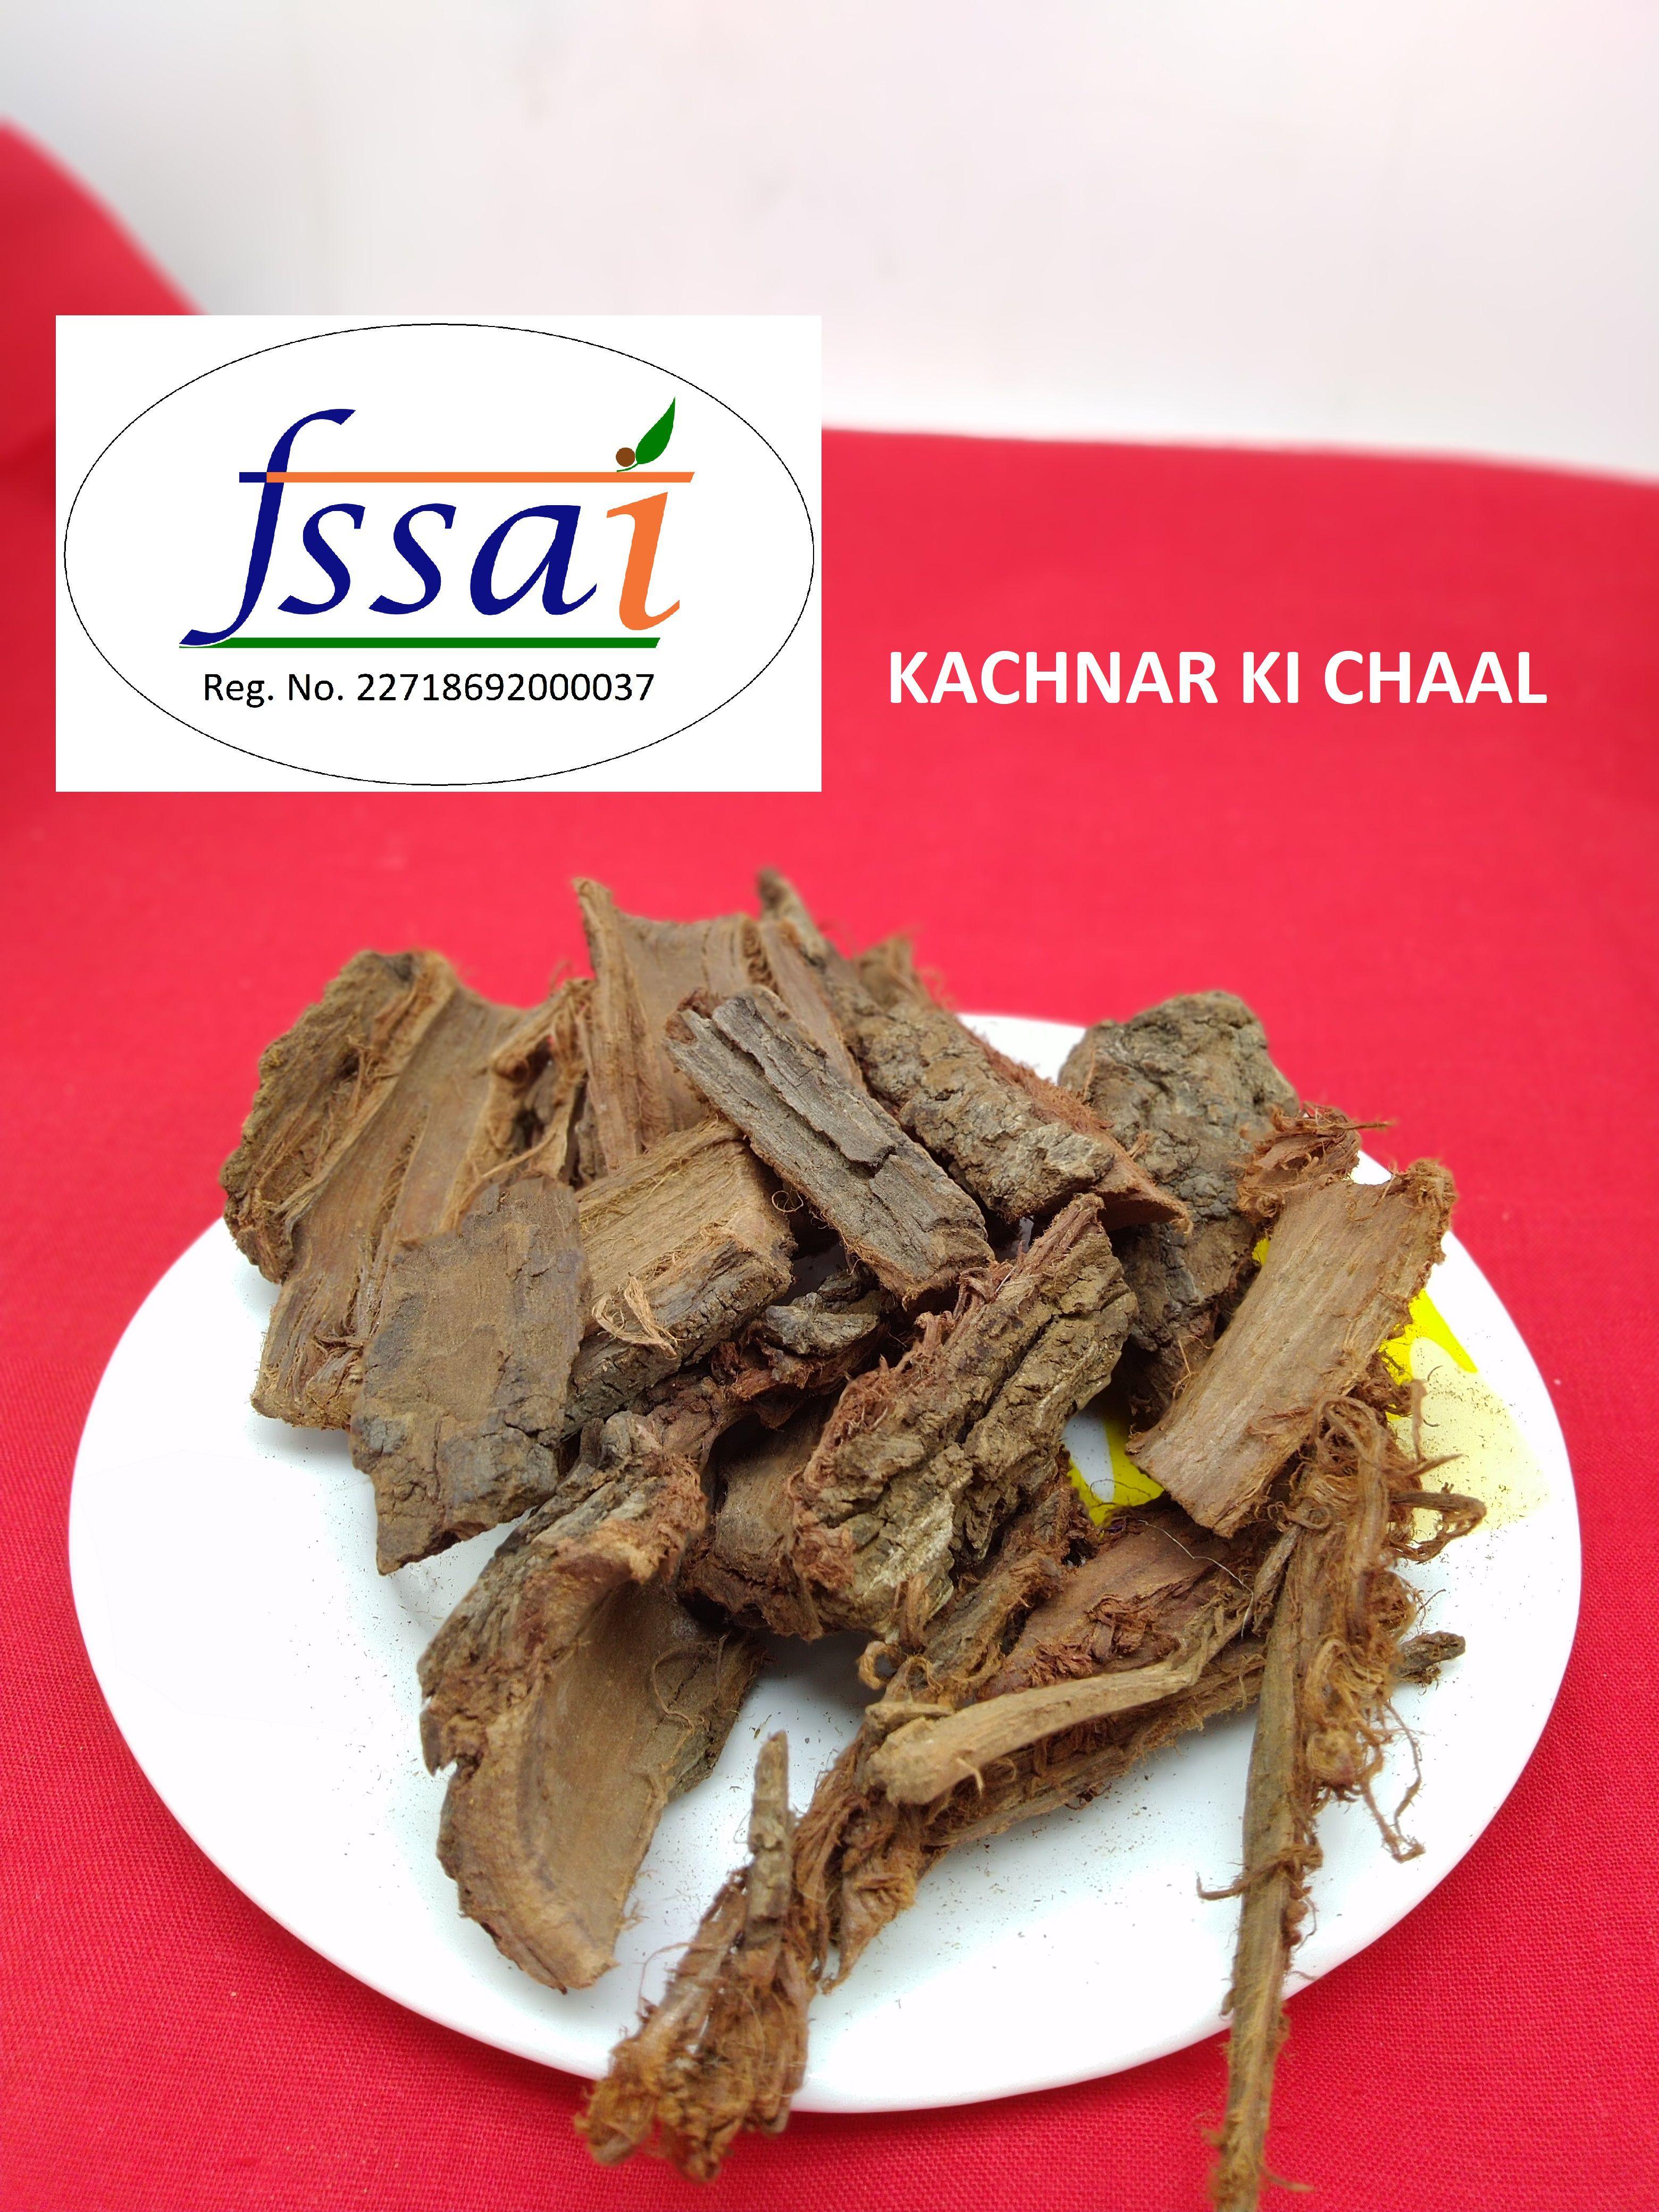 Shubh Supplies Kachnar ki chaal Bark 100 gm